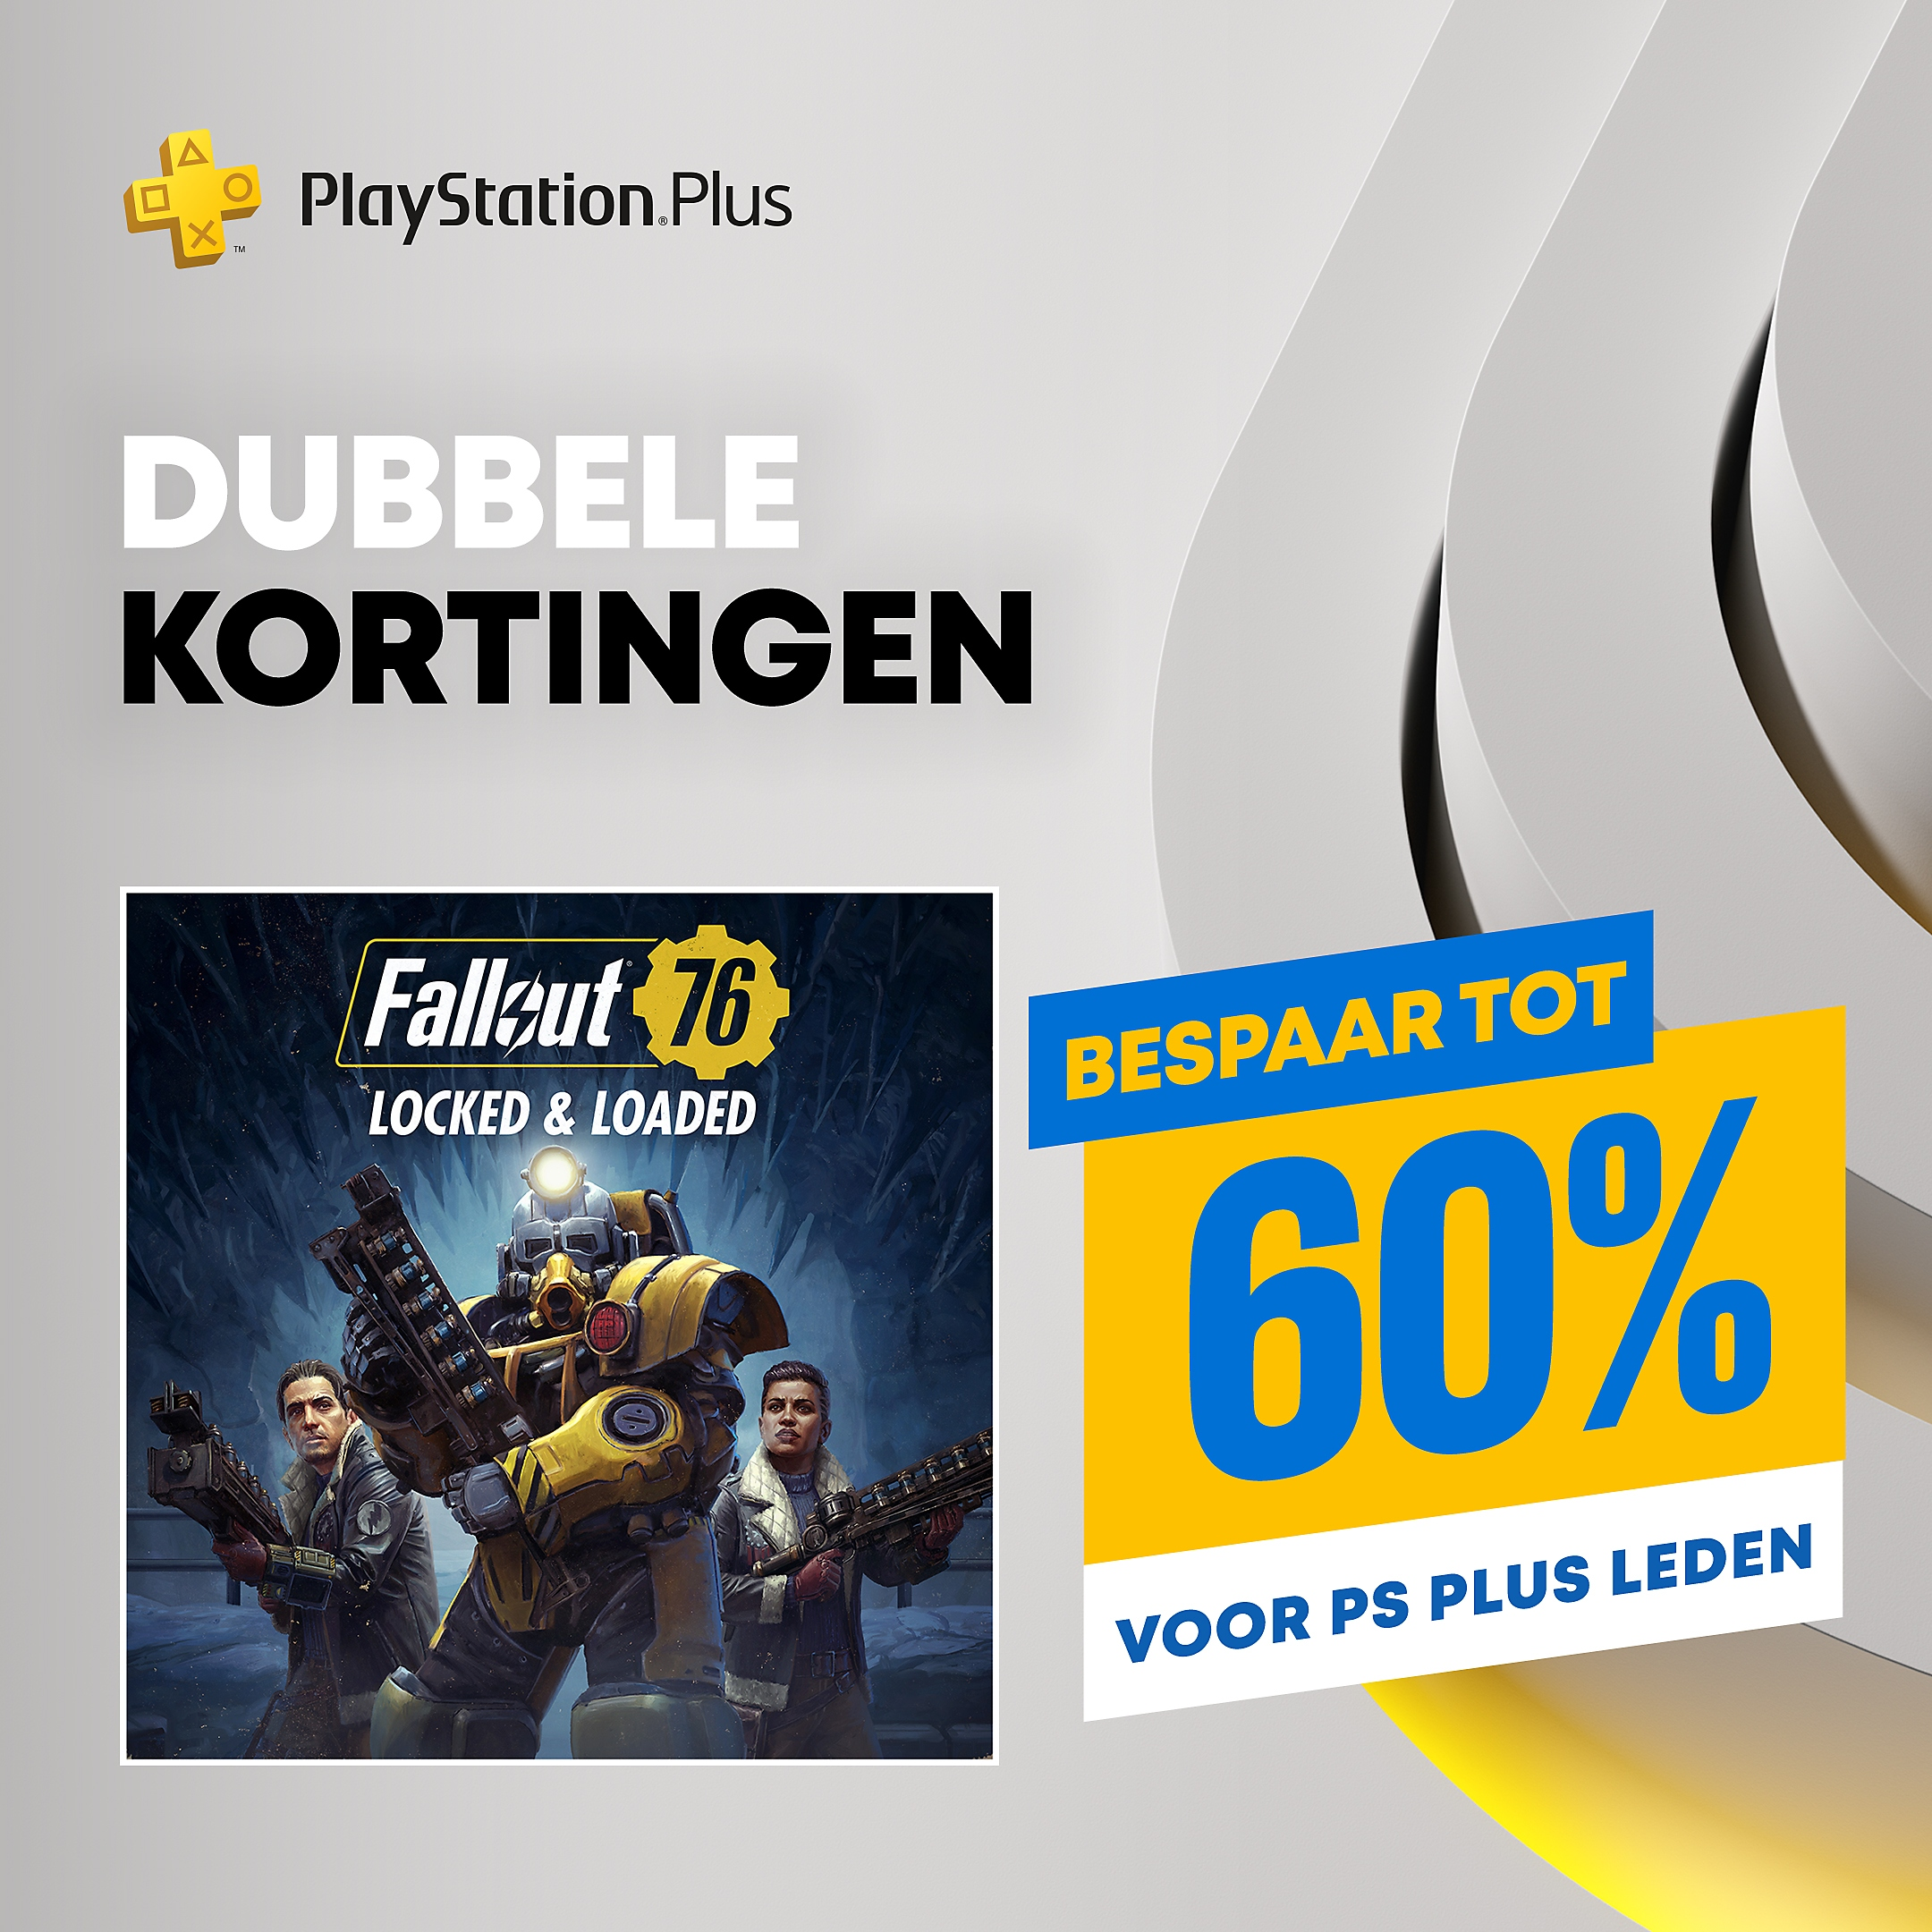 PlayStation Store - PS Plus dubbele kortingen